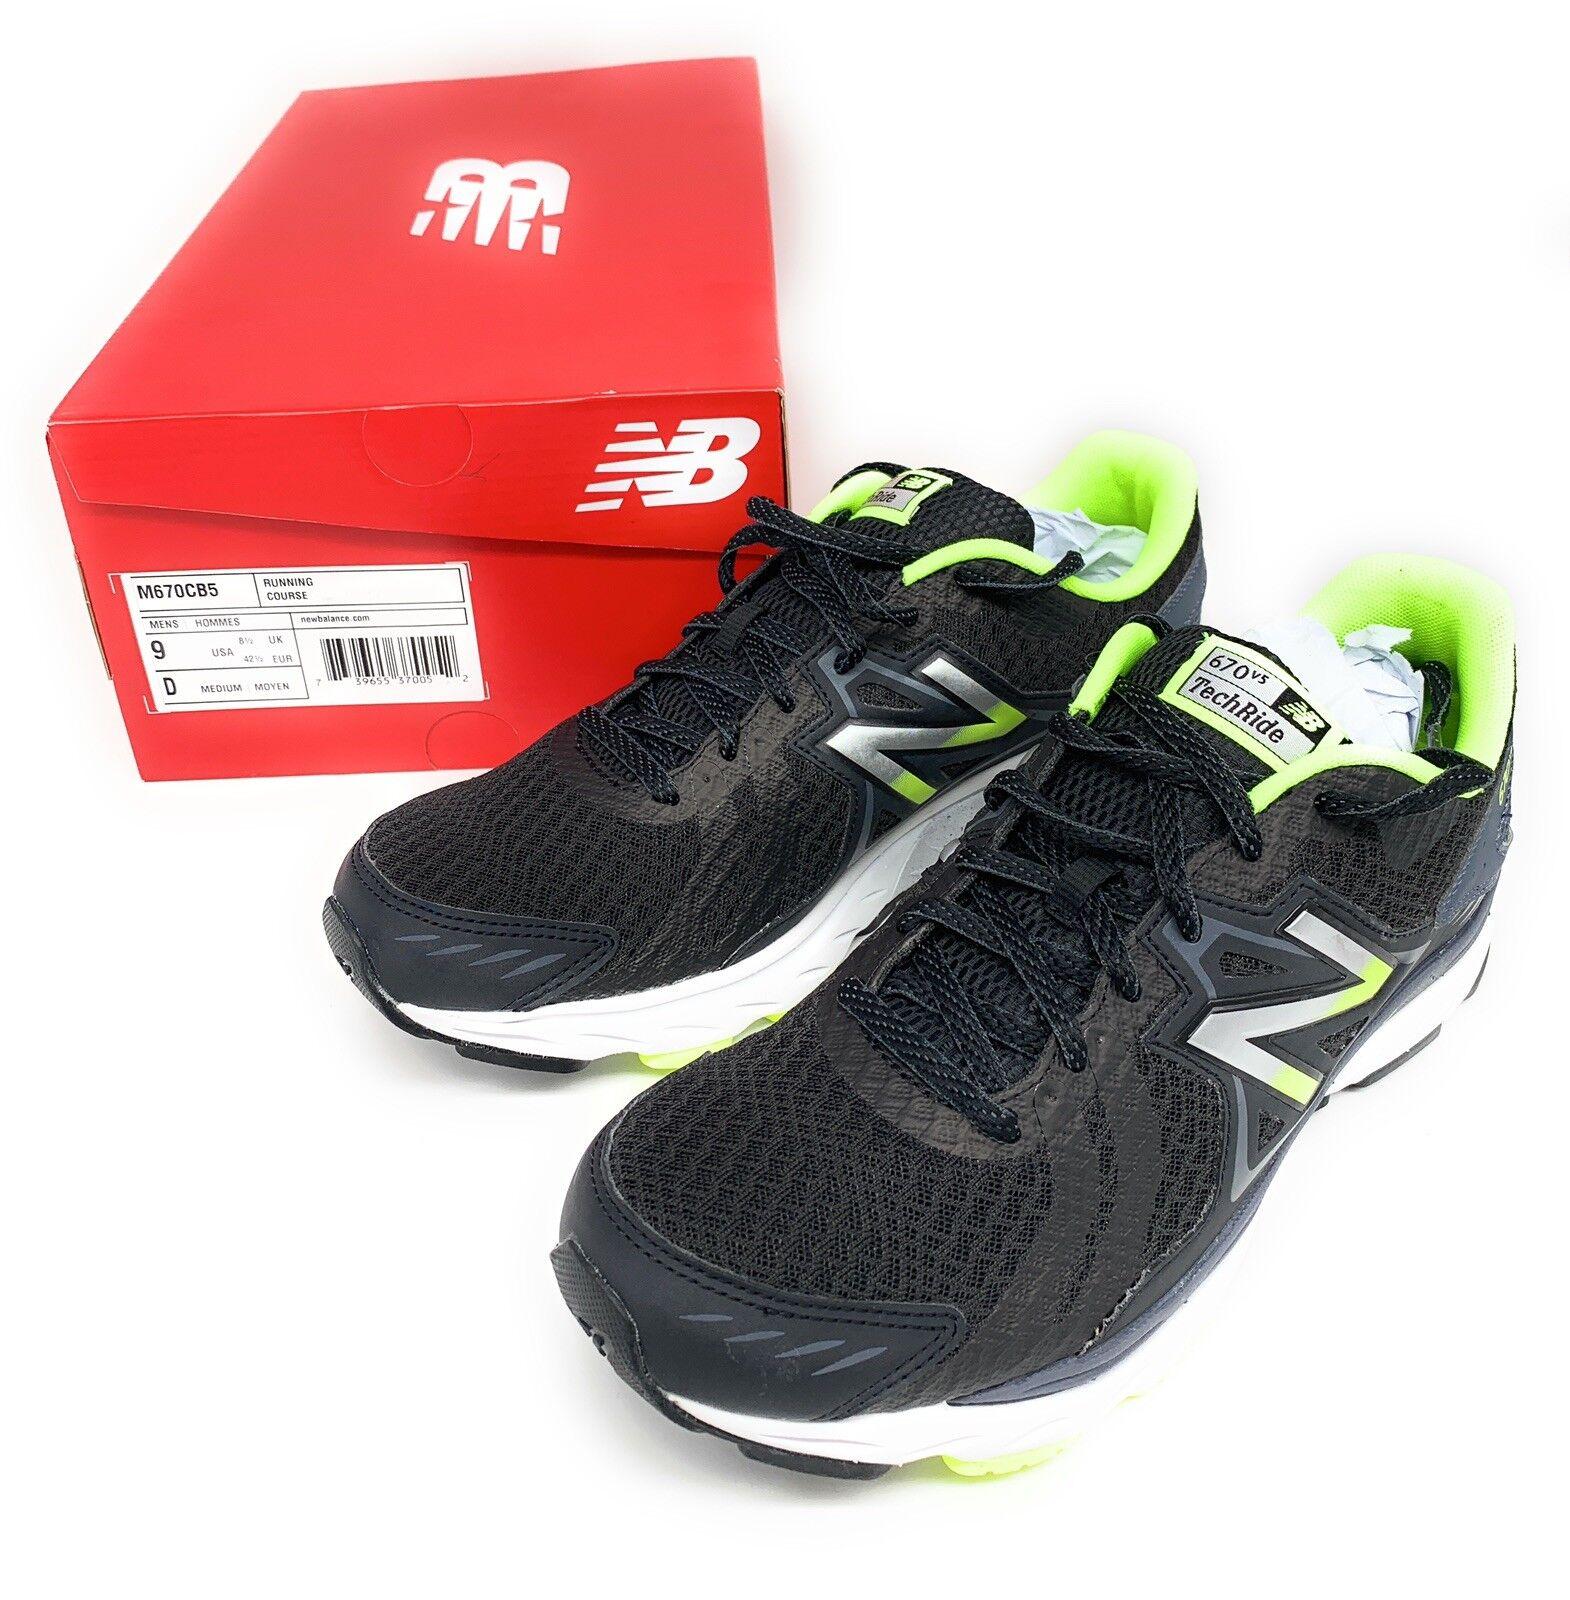 New Balance Men's Athletic Running shoes M670CB5 TechRide 670v5 Size 9 Medium